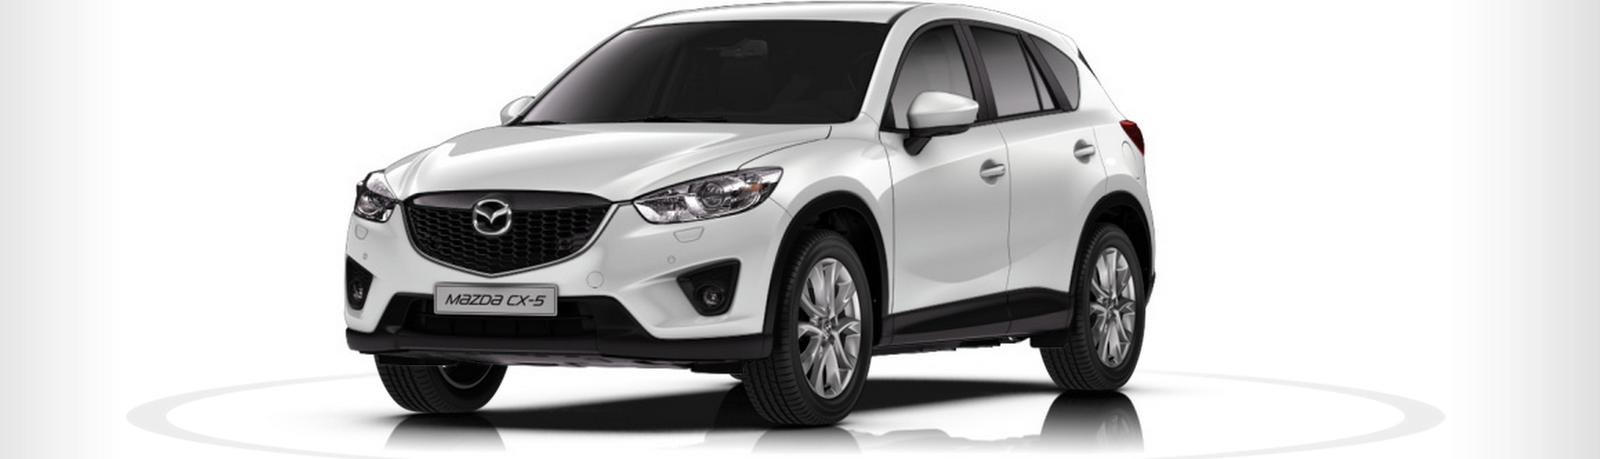 2015 Mazda CX-5 colour guide and prices | carwow2015 Mazda 3 White Paint Scrape Repair